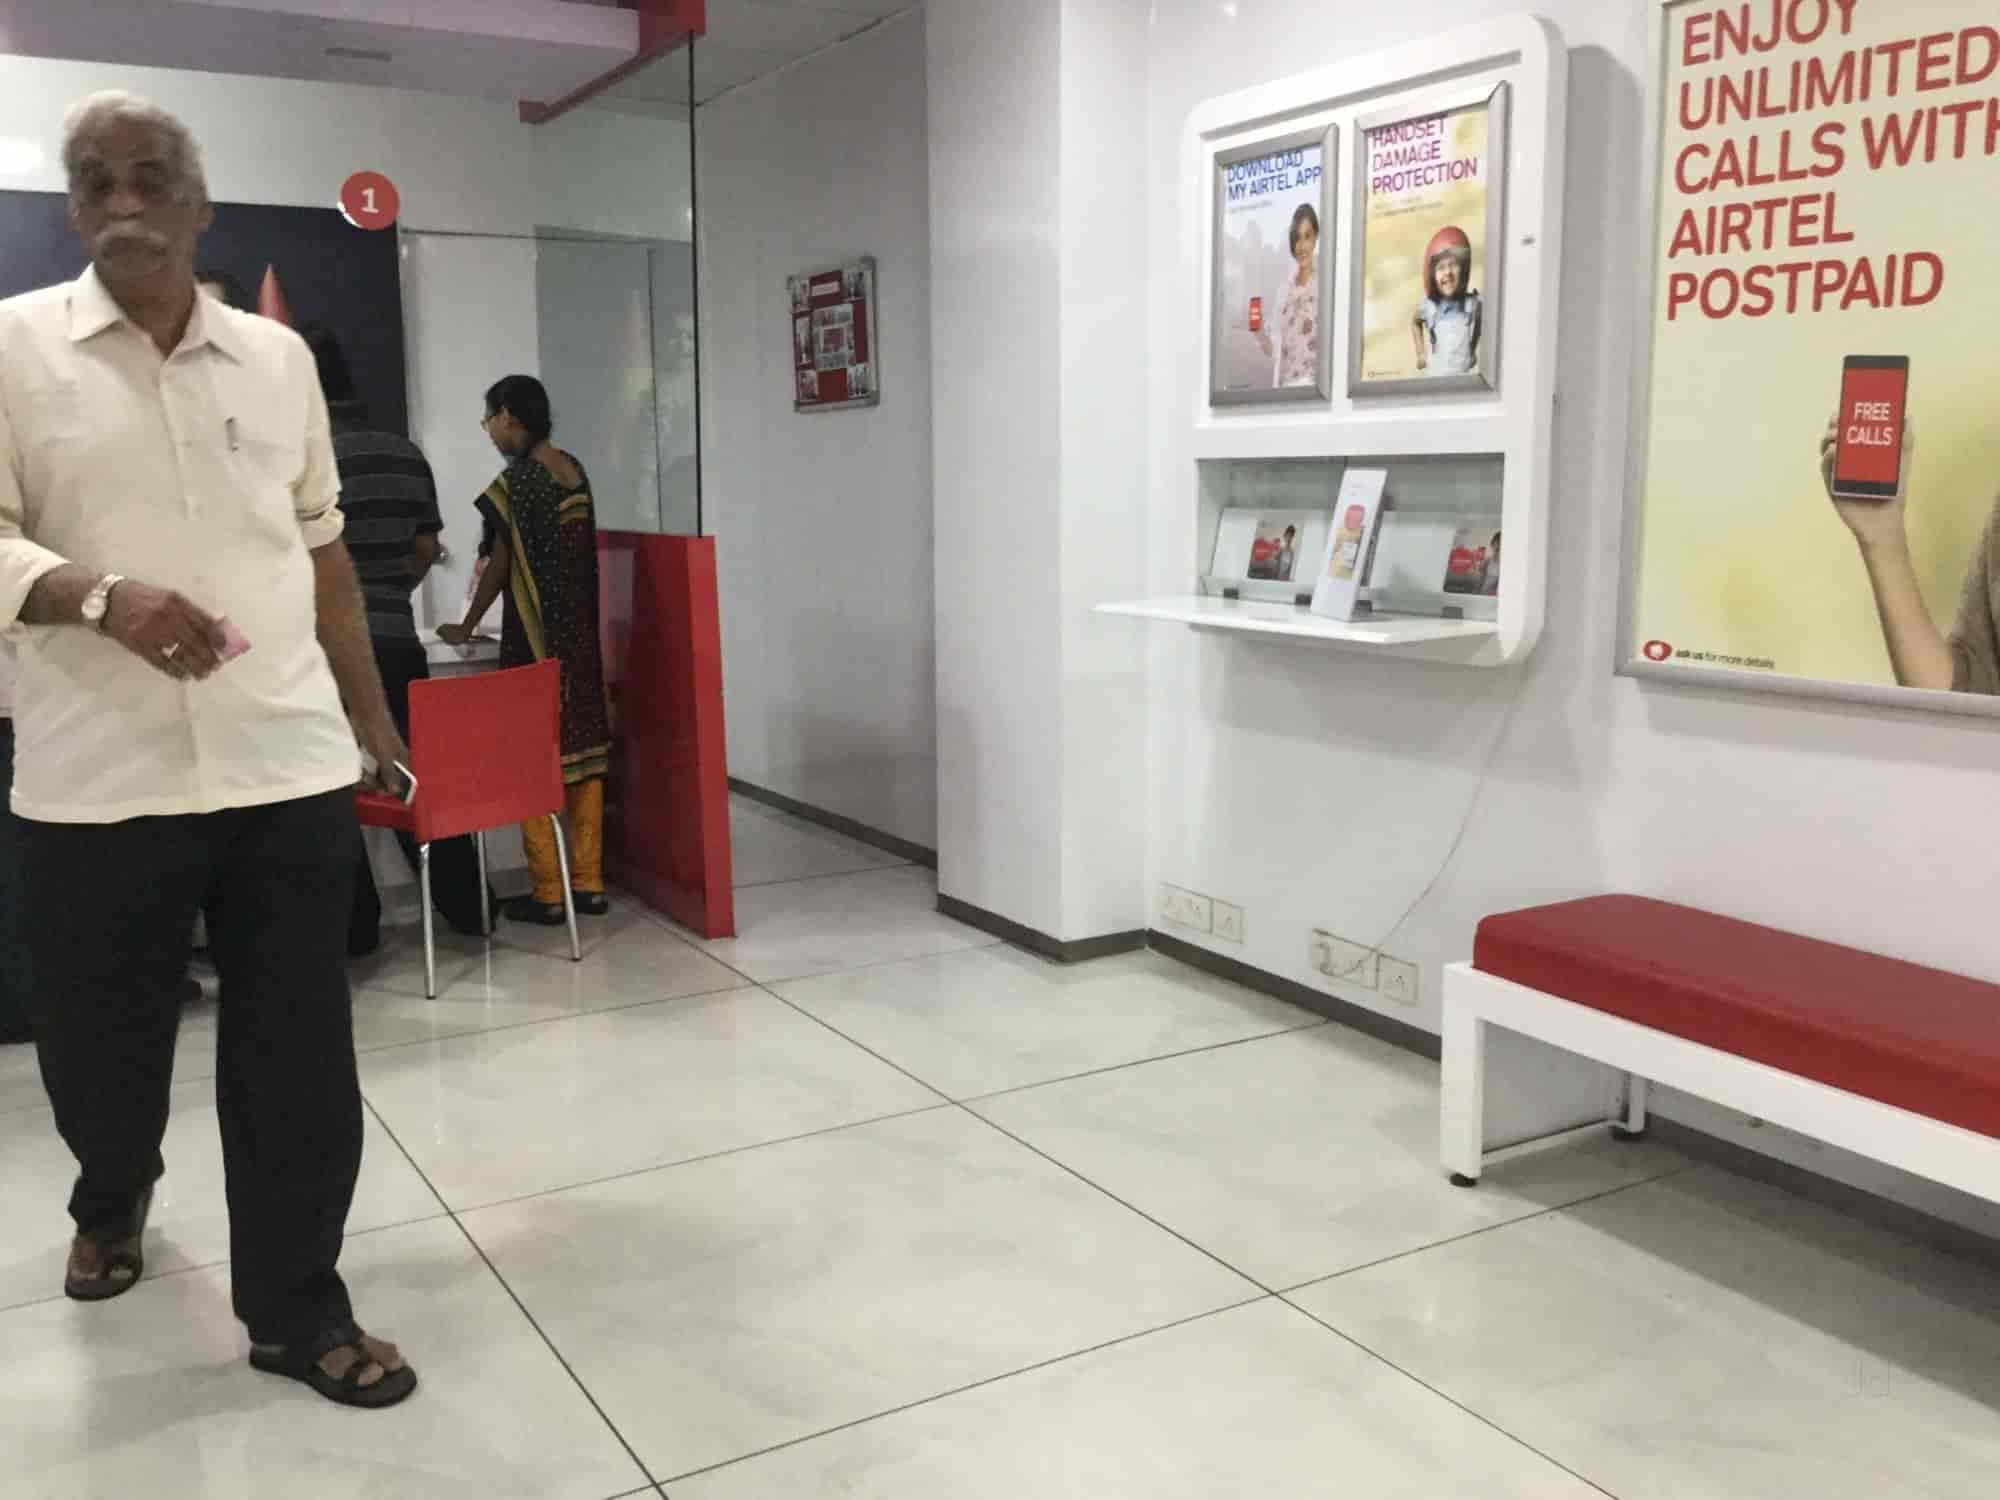 Airtel Relationship Centre, Seethammadhara - Internet Service